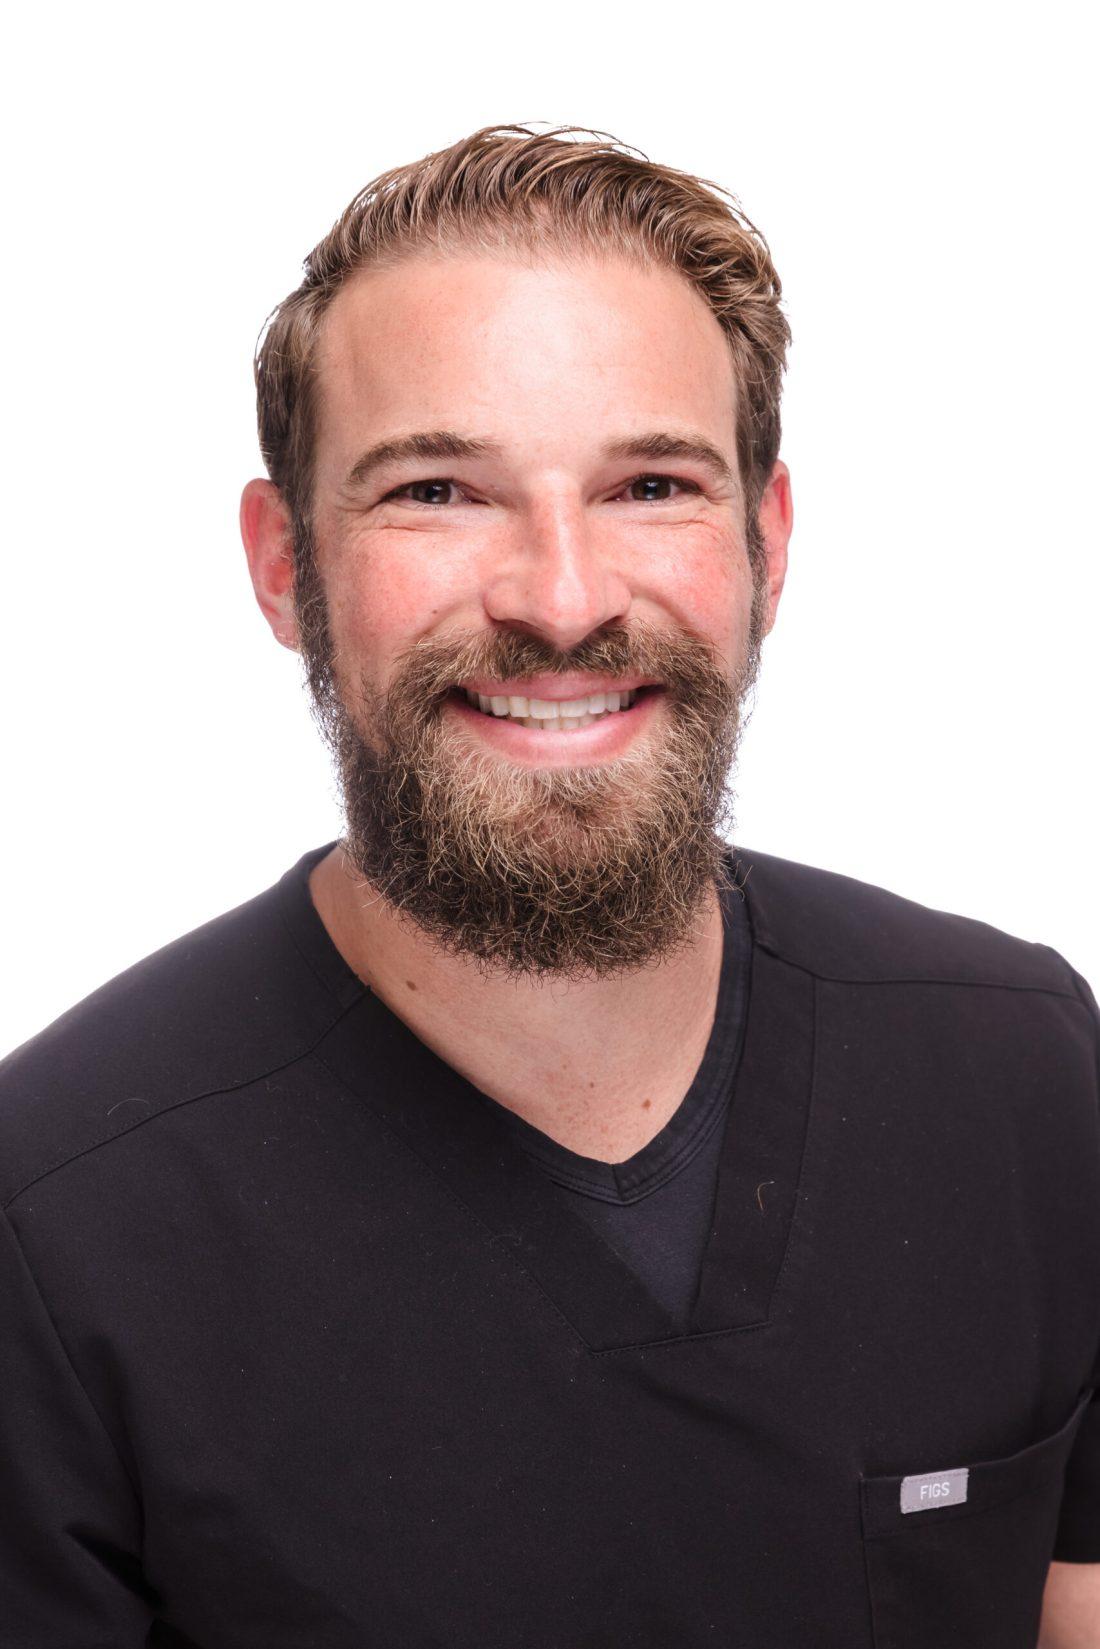 Dr. Corpodian